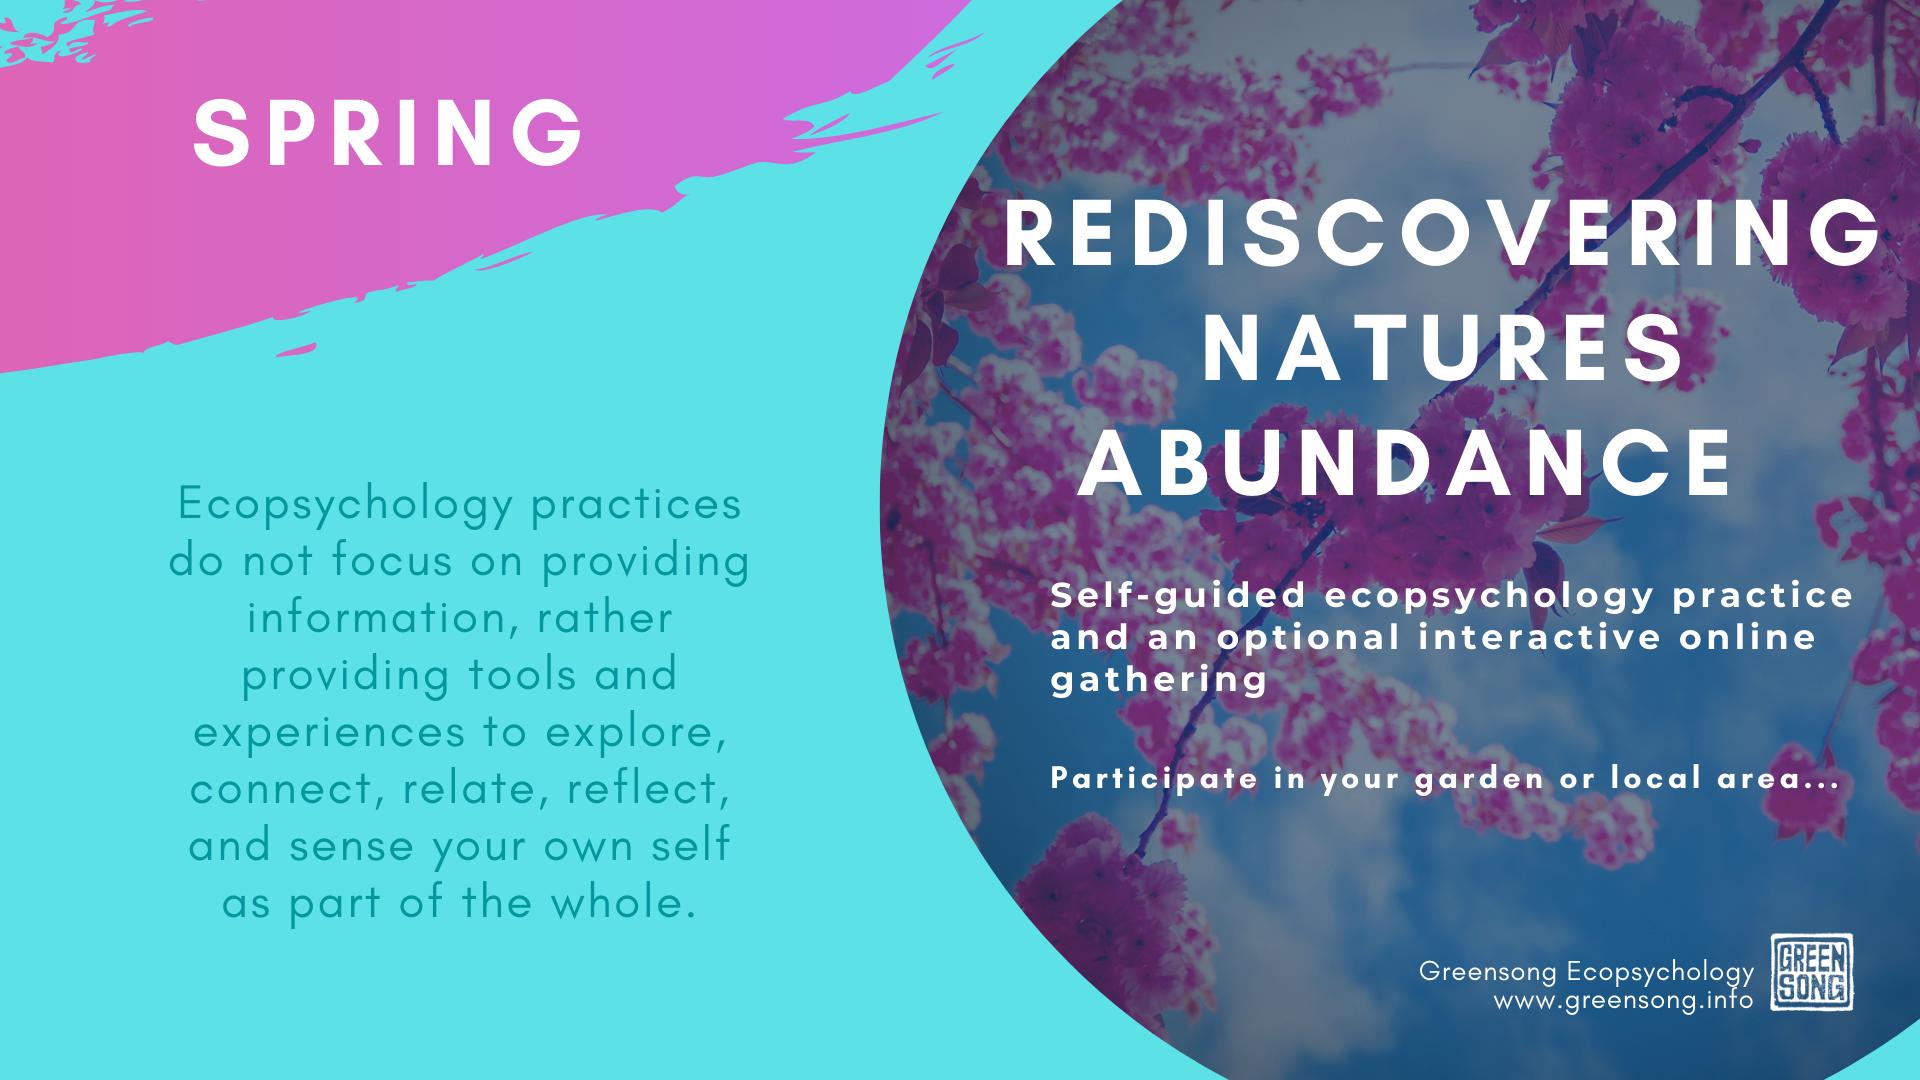 Rediscovering Natures Abundance